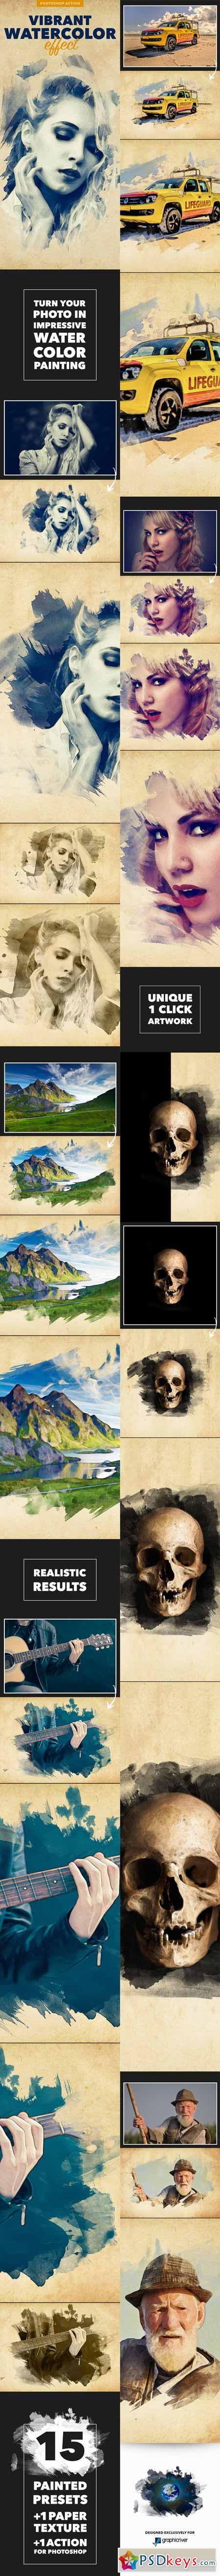 Vibrant Watercolor Effect - Photoshop Action 11869640